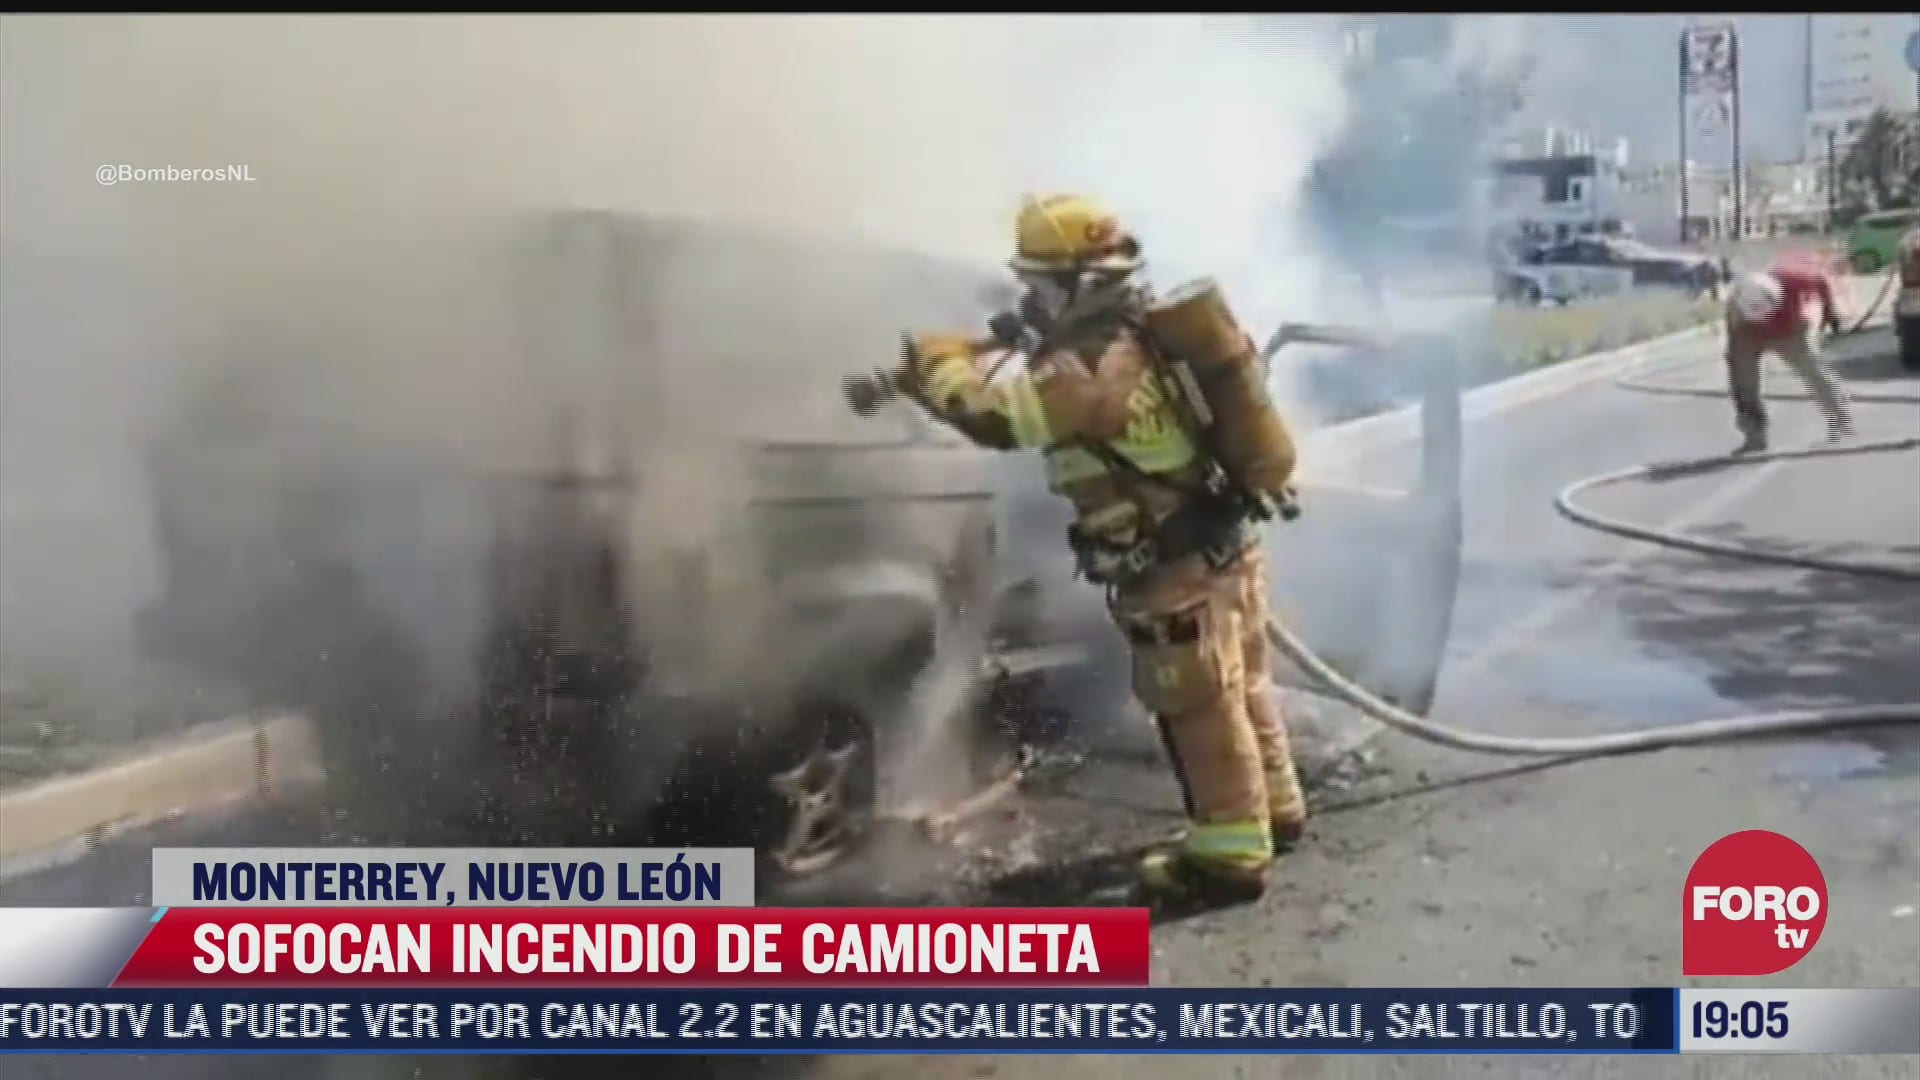 camioneta se incendia en calles de monterrey